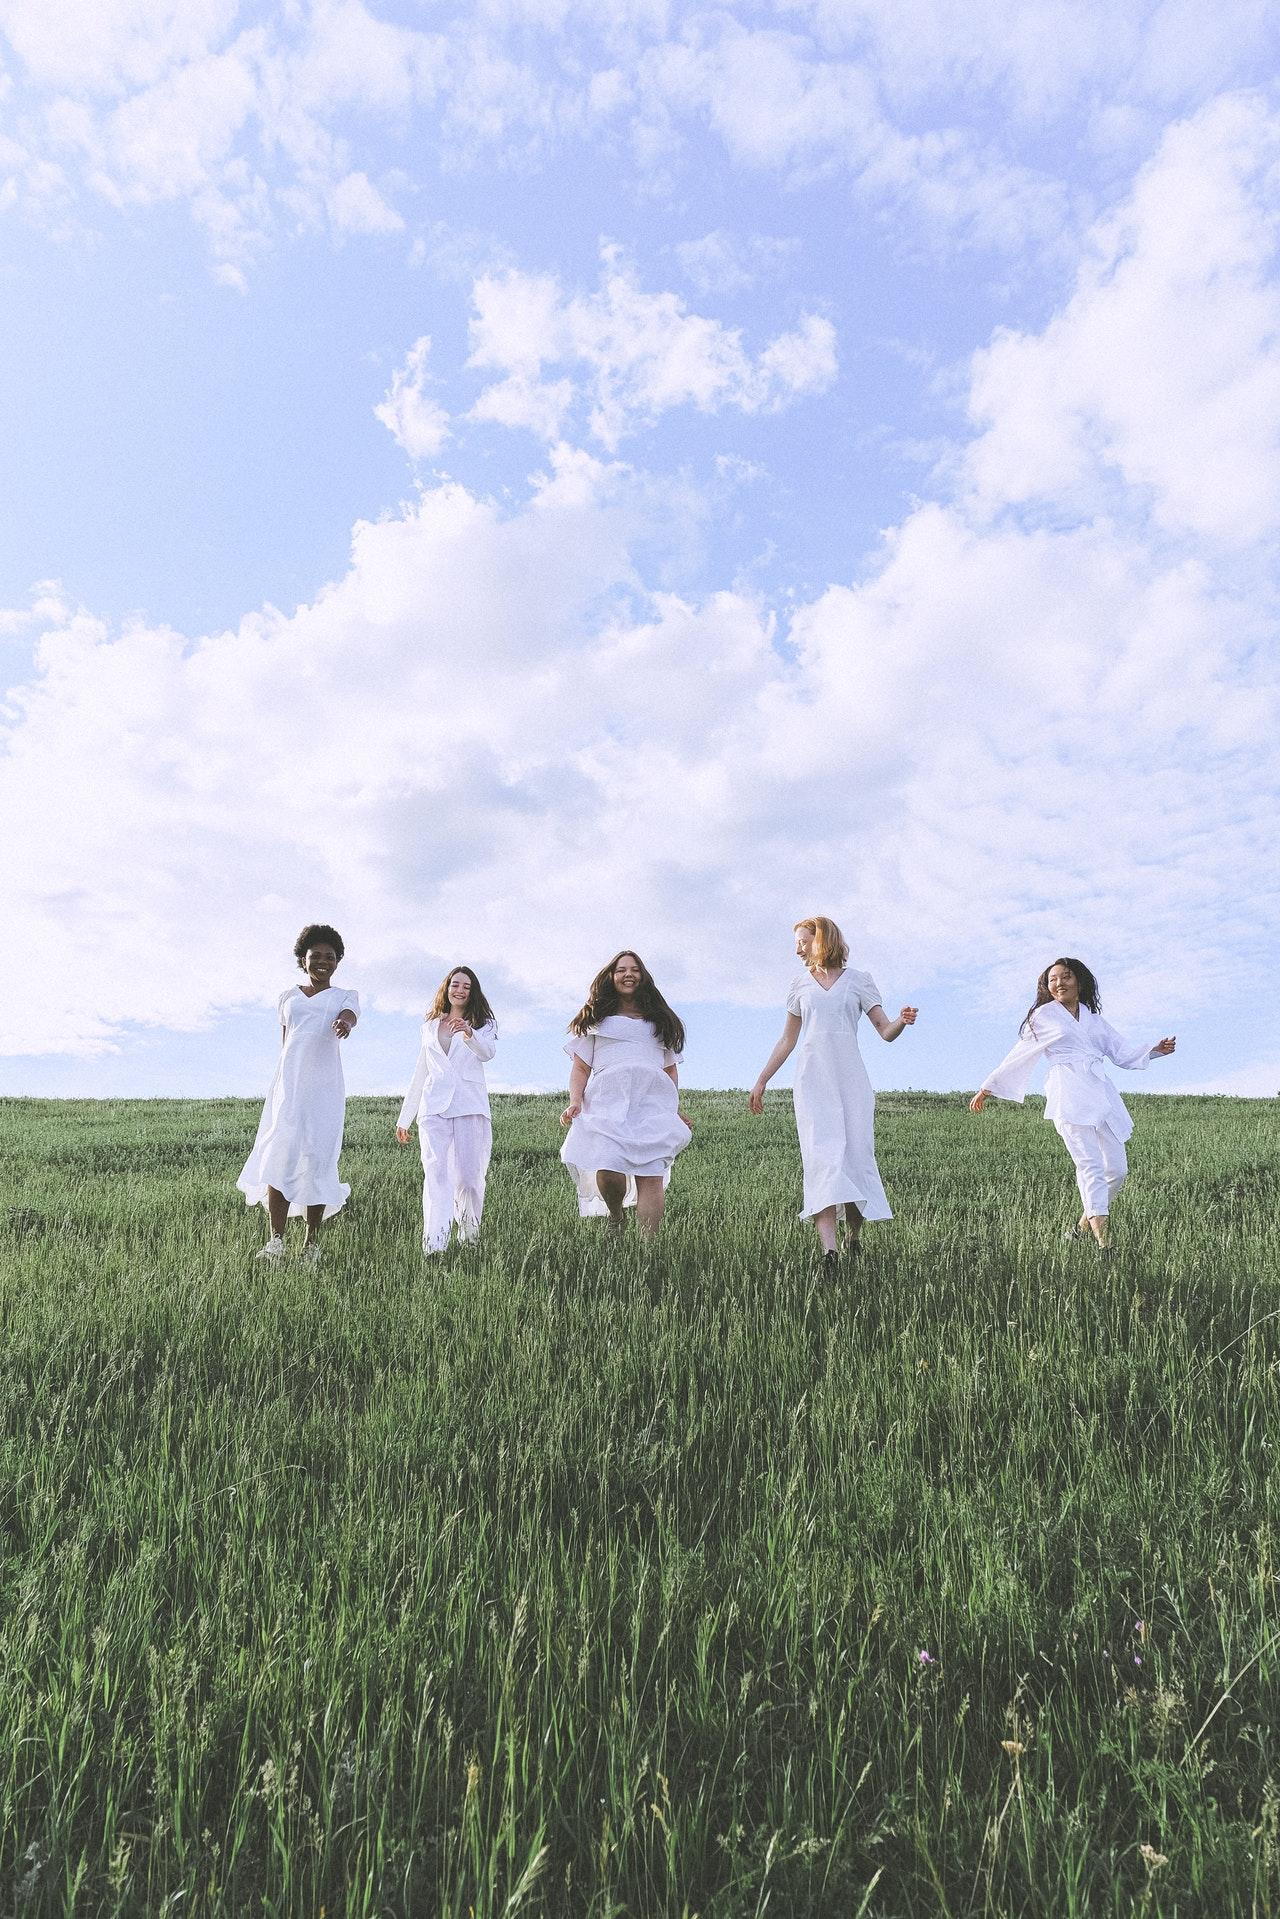 Pandora lanceert nieuwe campagne rondom Sisterhood